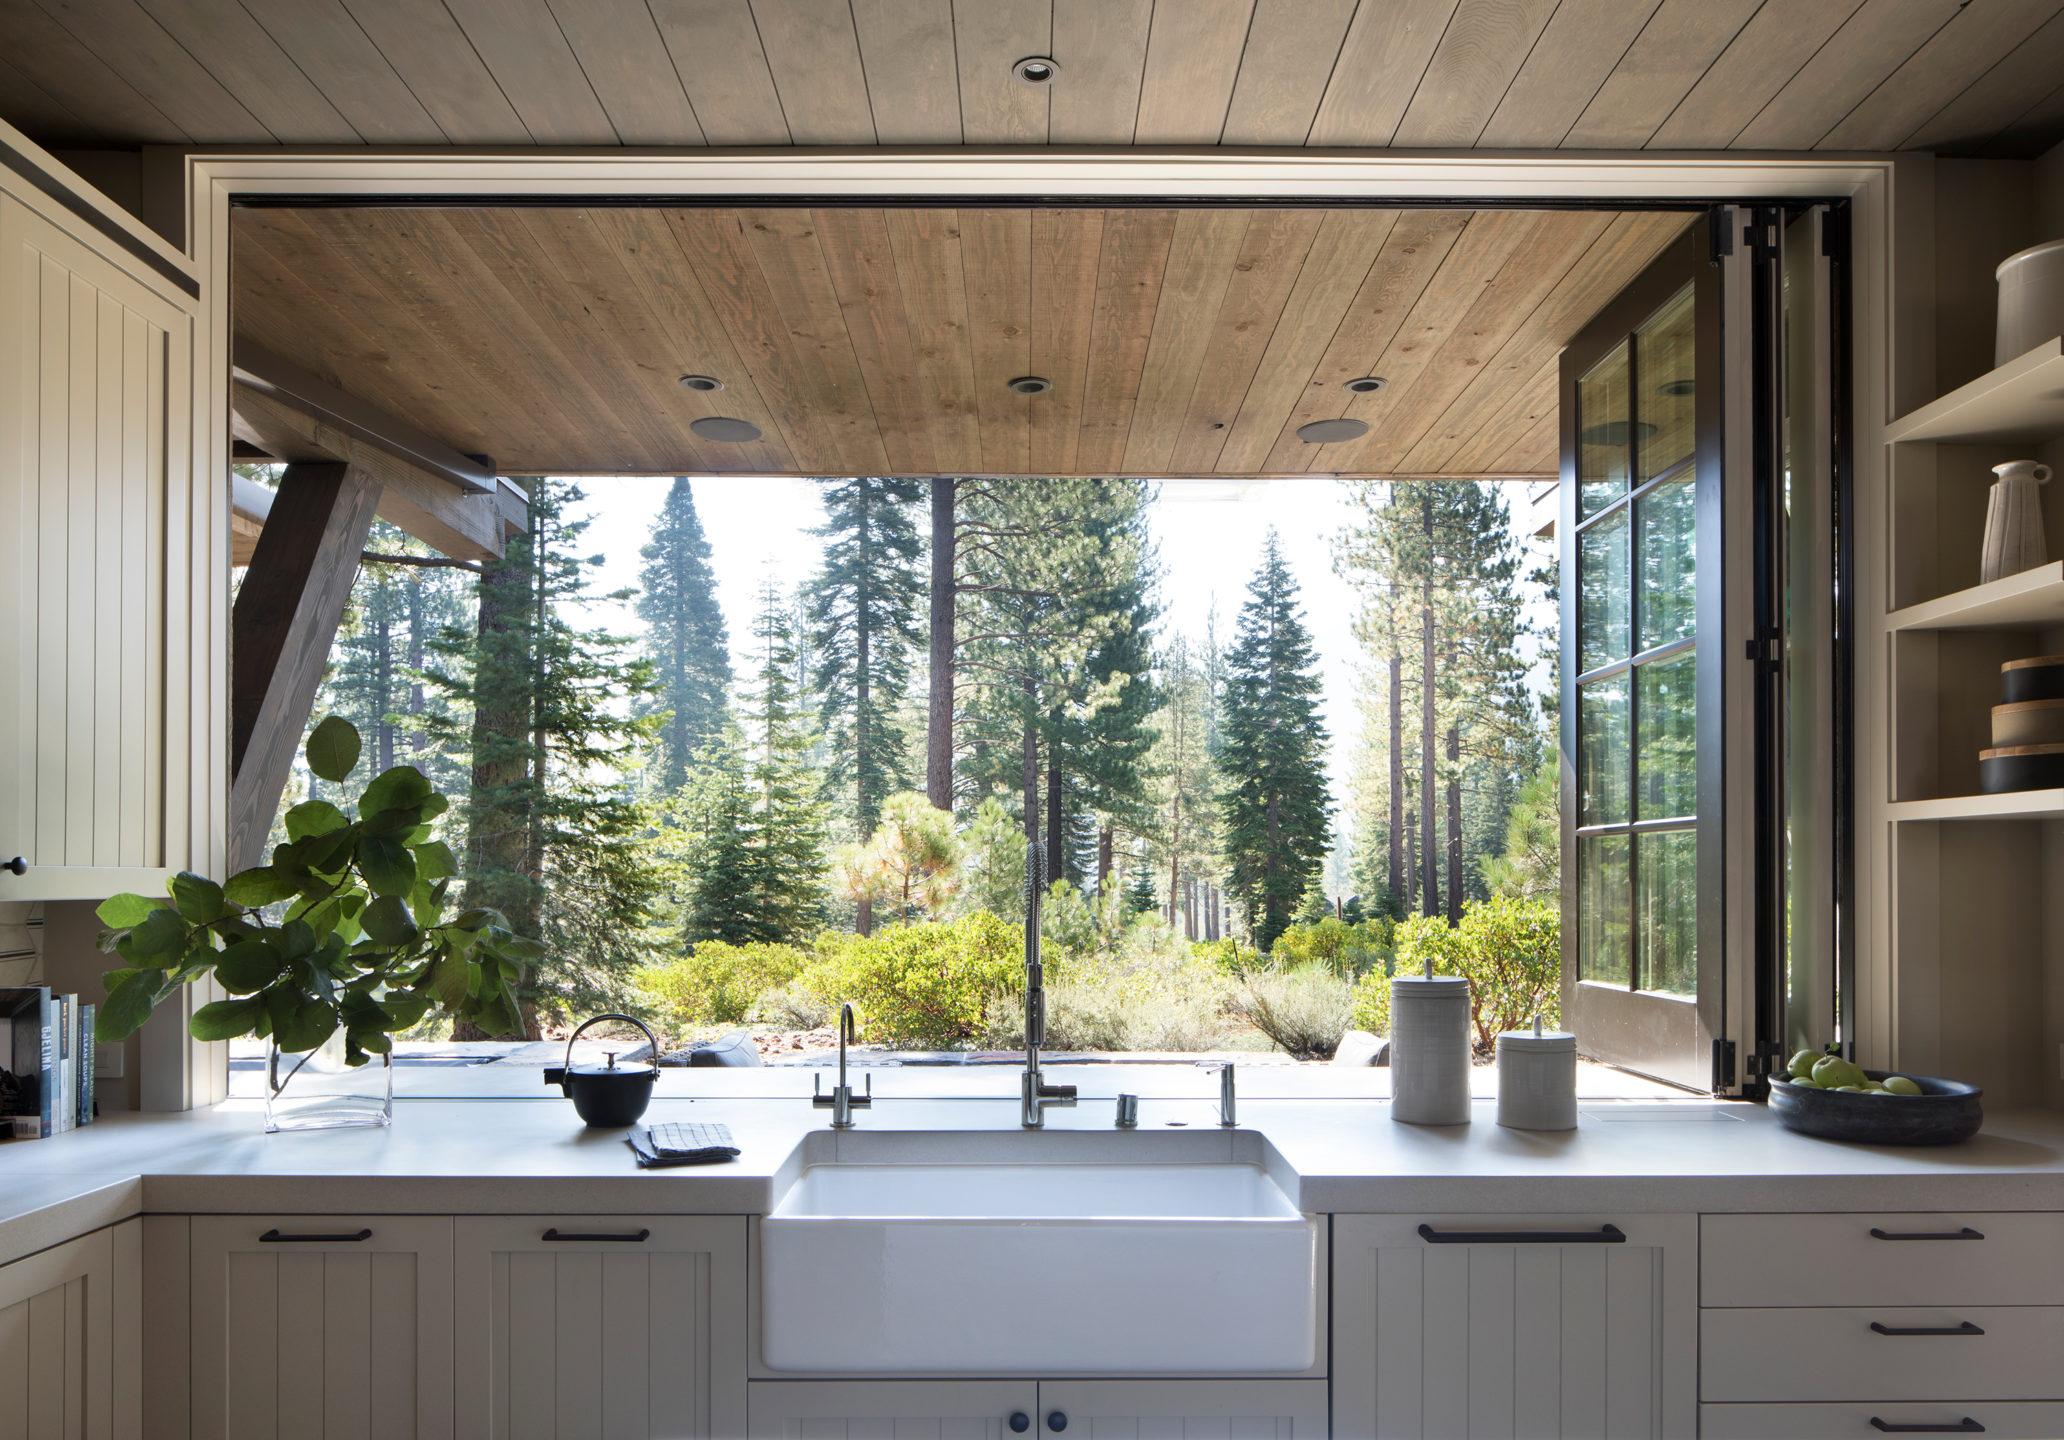 Jennifer_robins_interiors_projects_martis_camp_Del_Grand_03_HR_kitchen_sink_ws